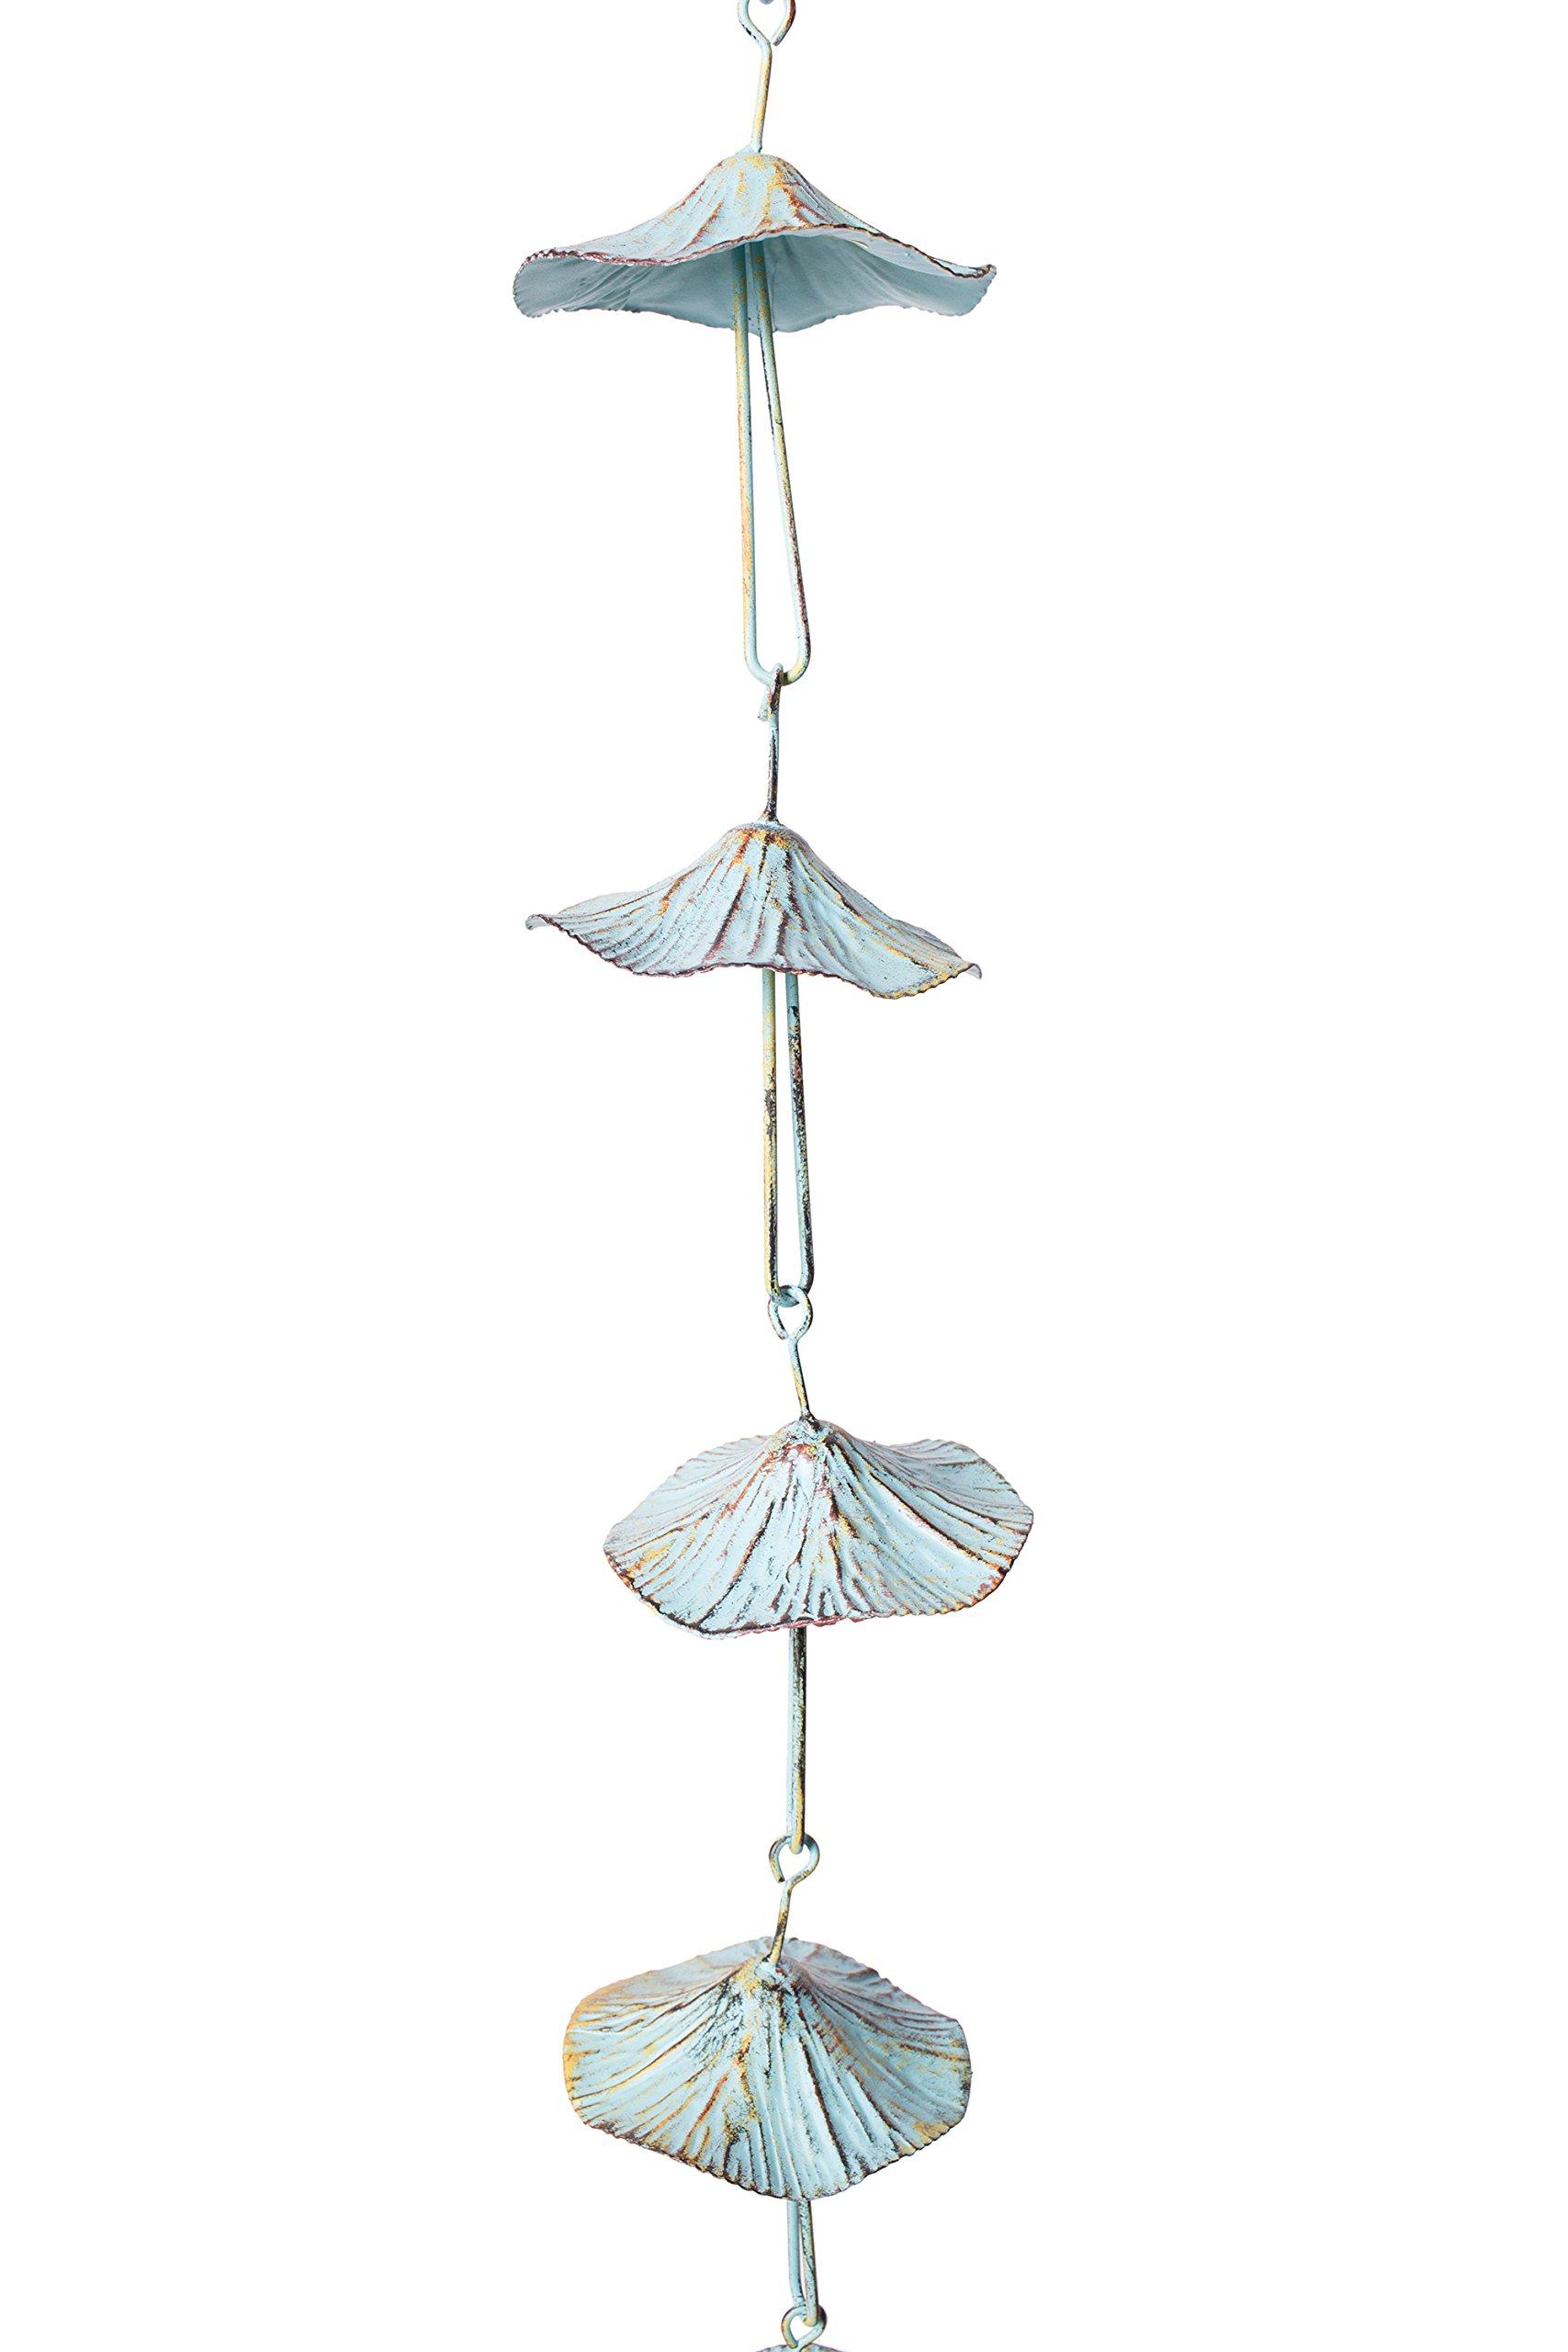 Lovely Decorative Mushroom Metal Rain Chain, Iron Rain Catcher Ornament, Green Patina Finish, Large 5 Feet